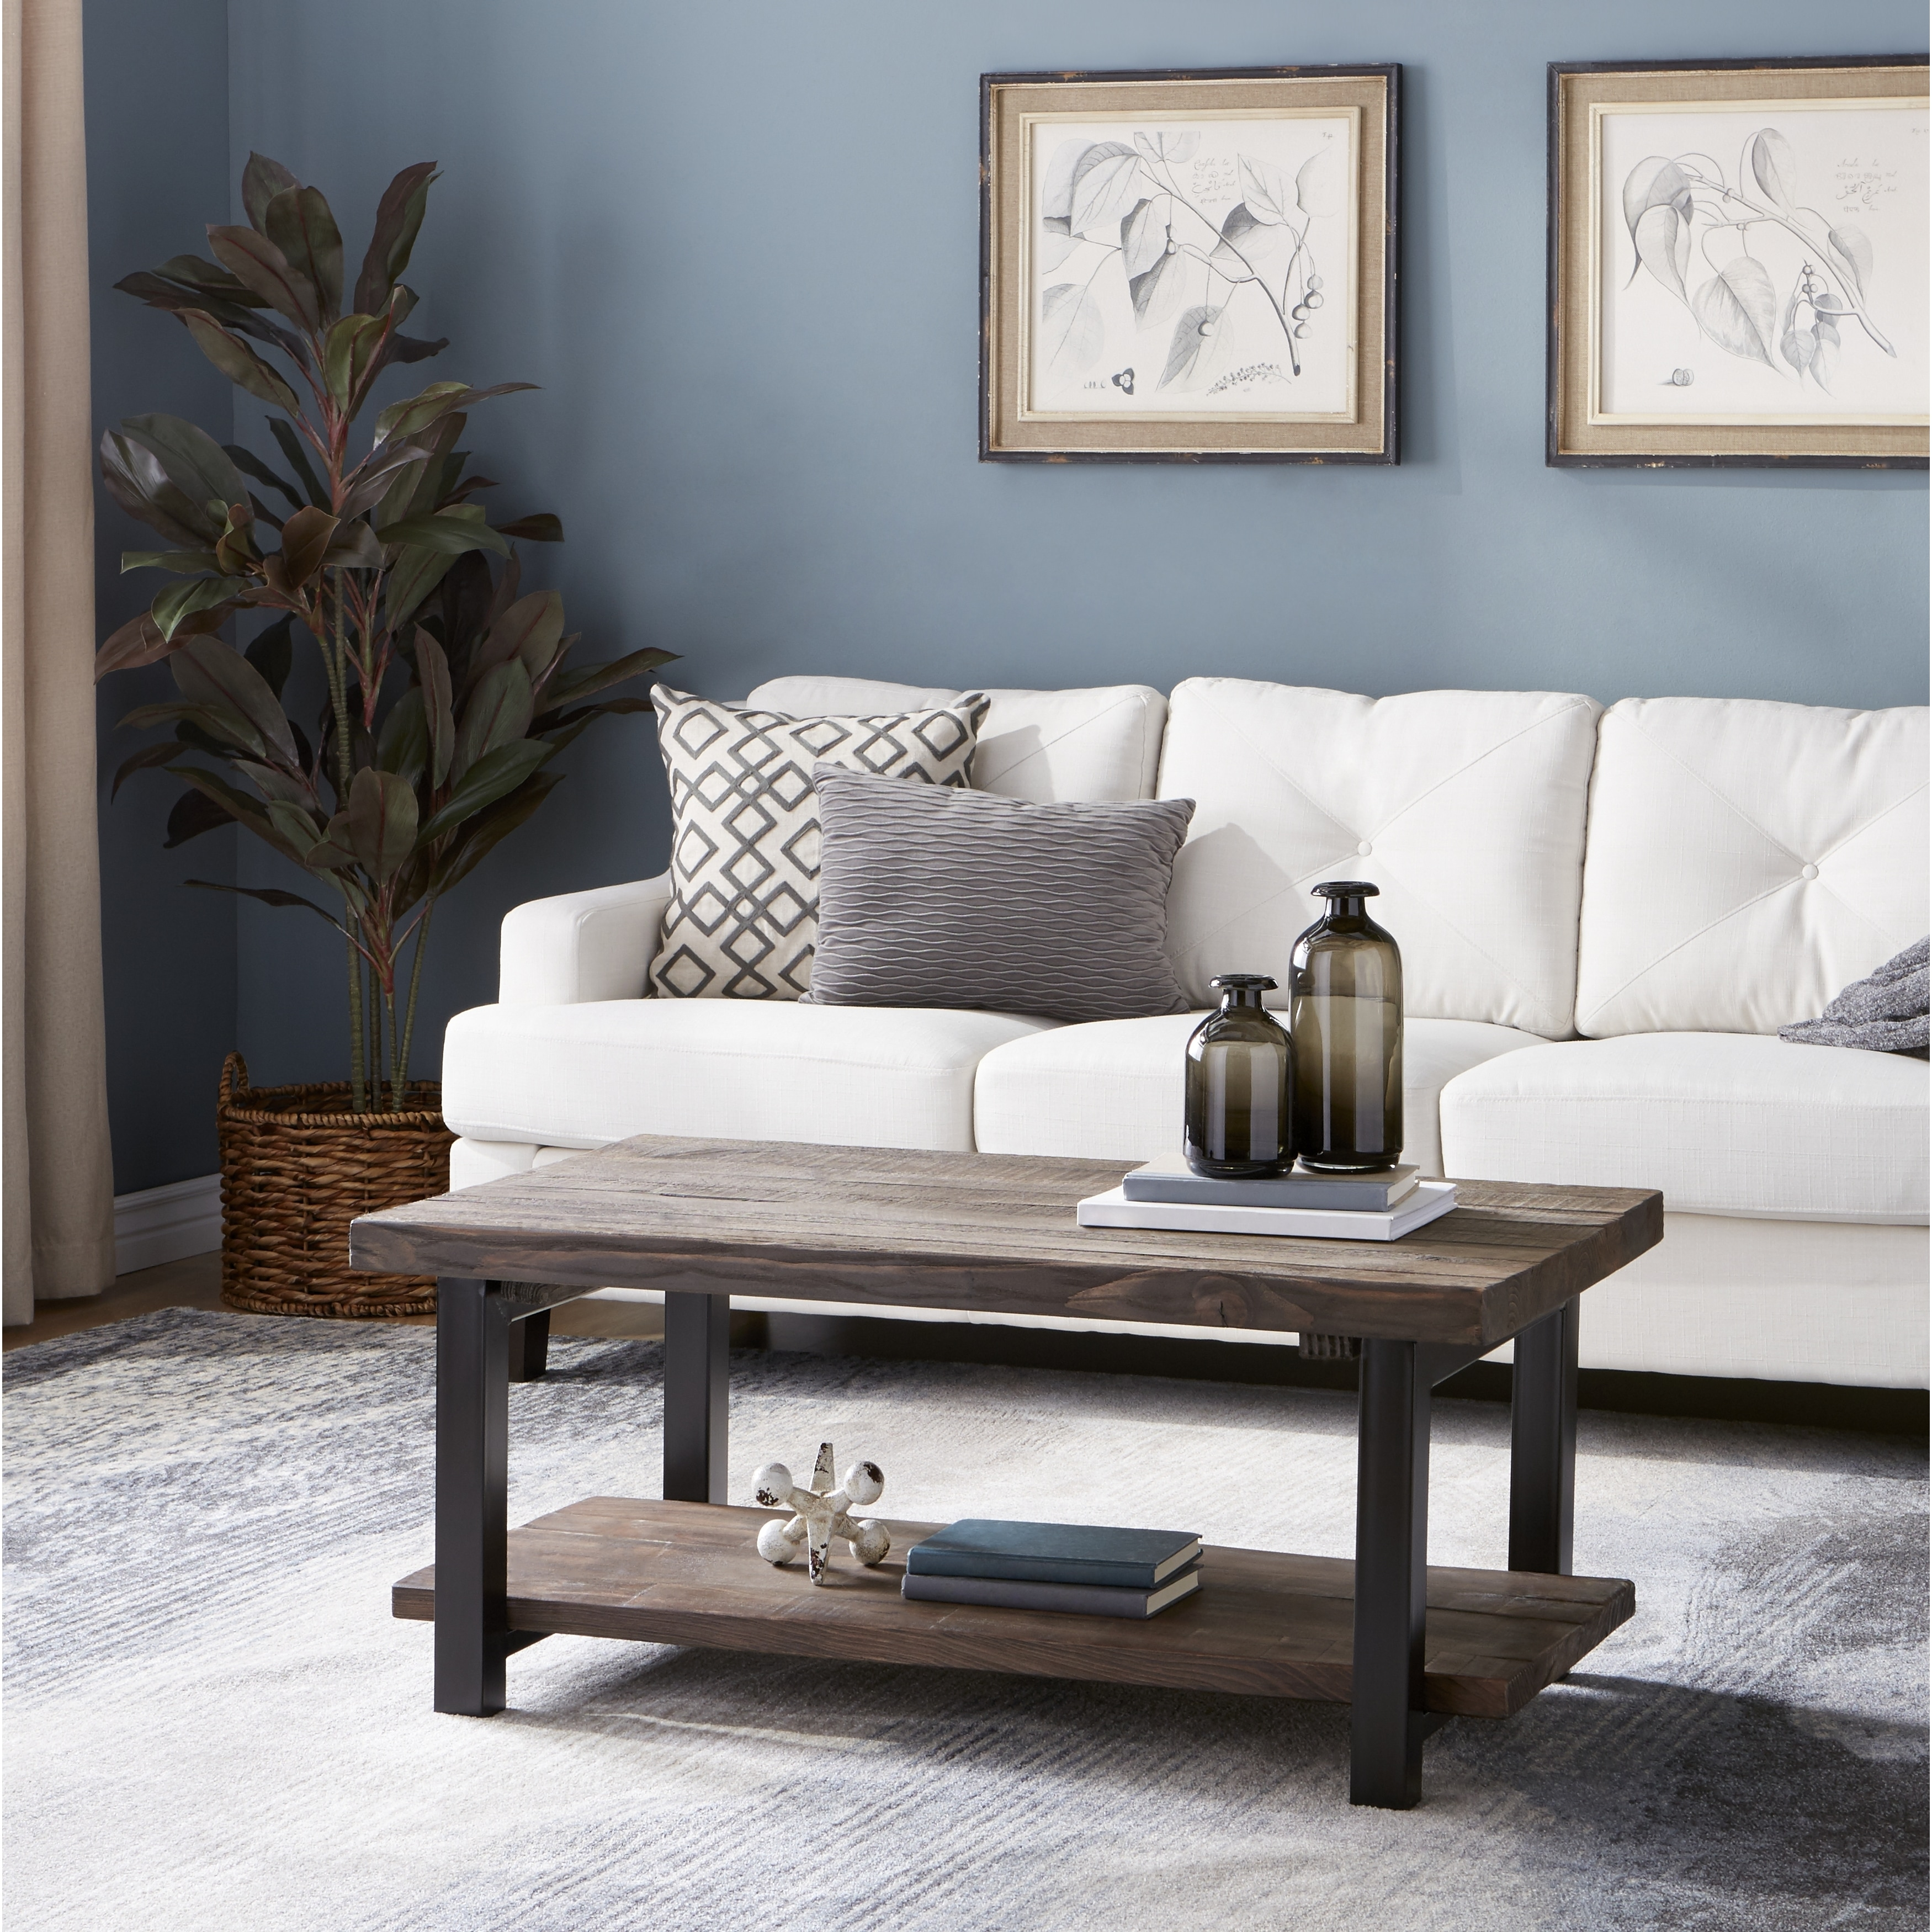 farmhouse coffee table low 2 tier living room display